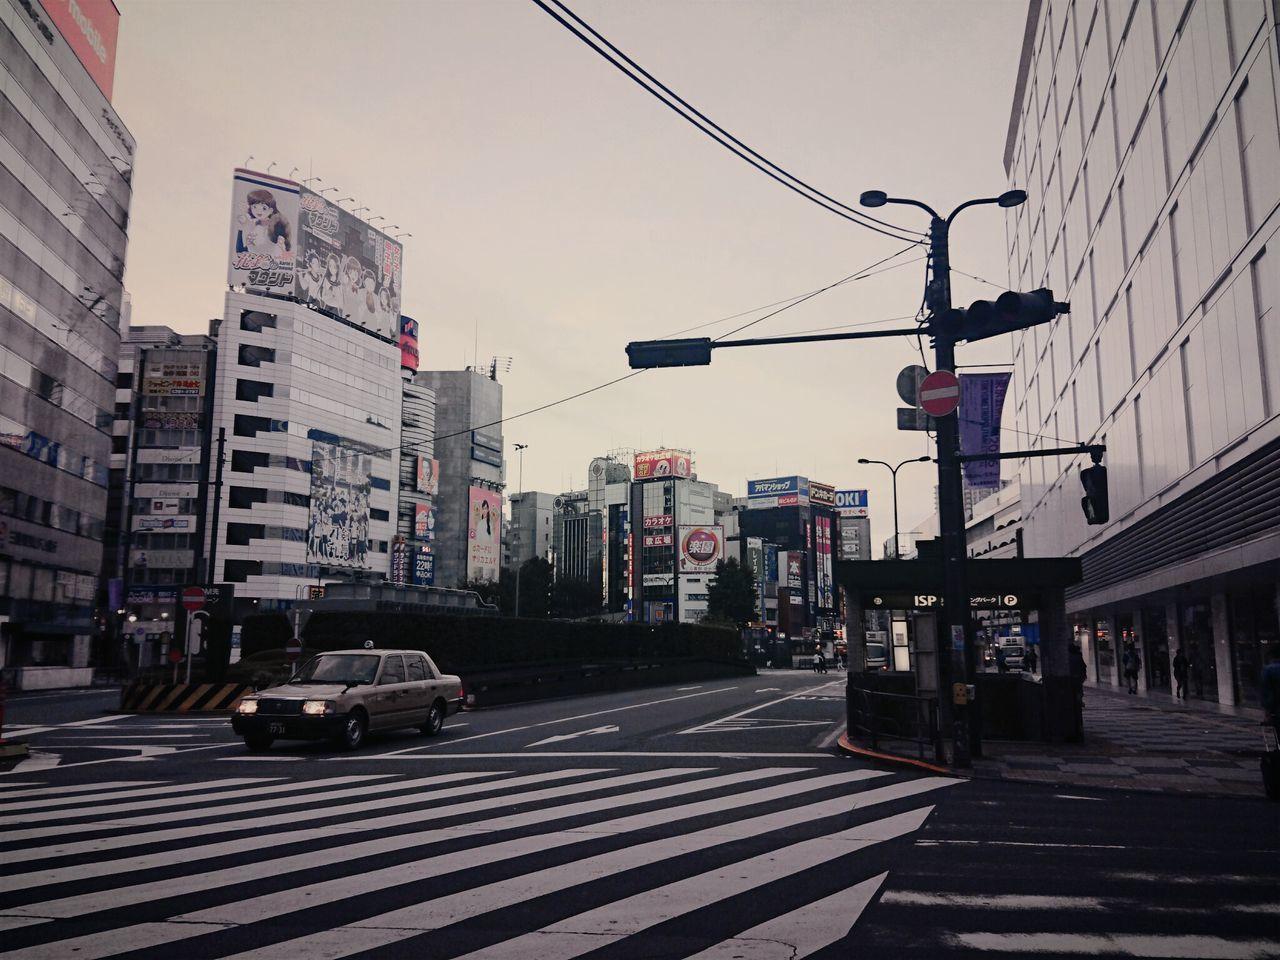 City Building Exterior Outdoors Urban Skyline Cityscape No People Japan さよなら 朝 だれもいない